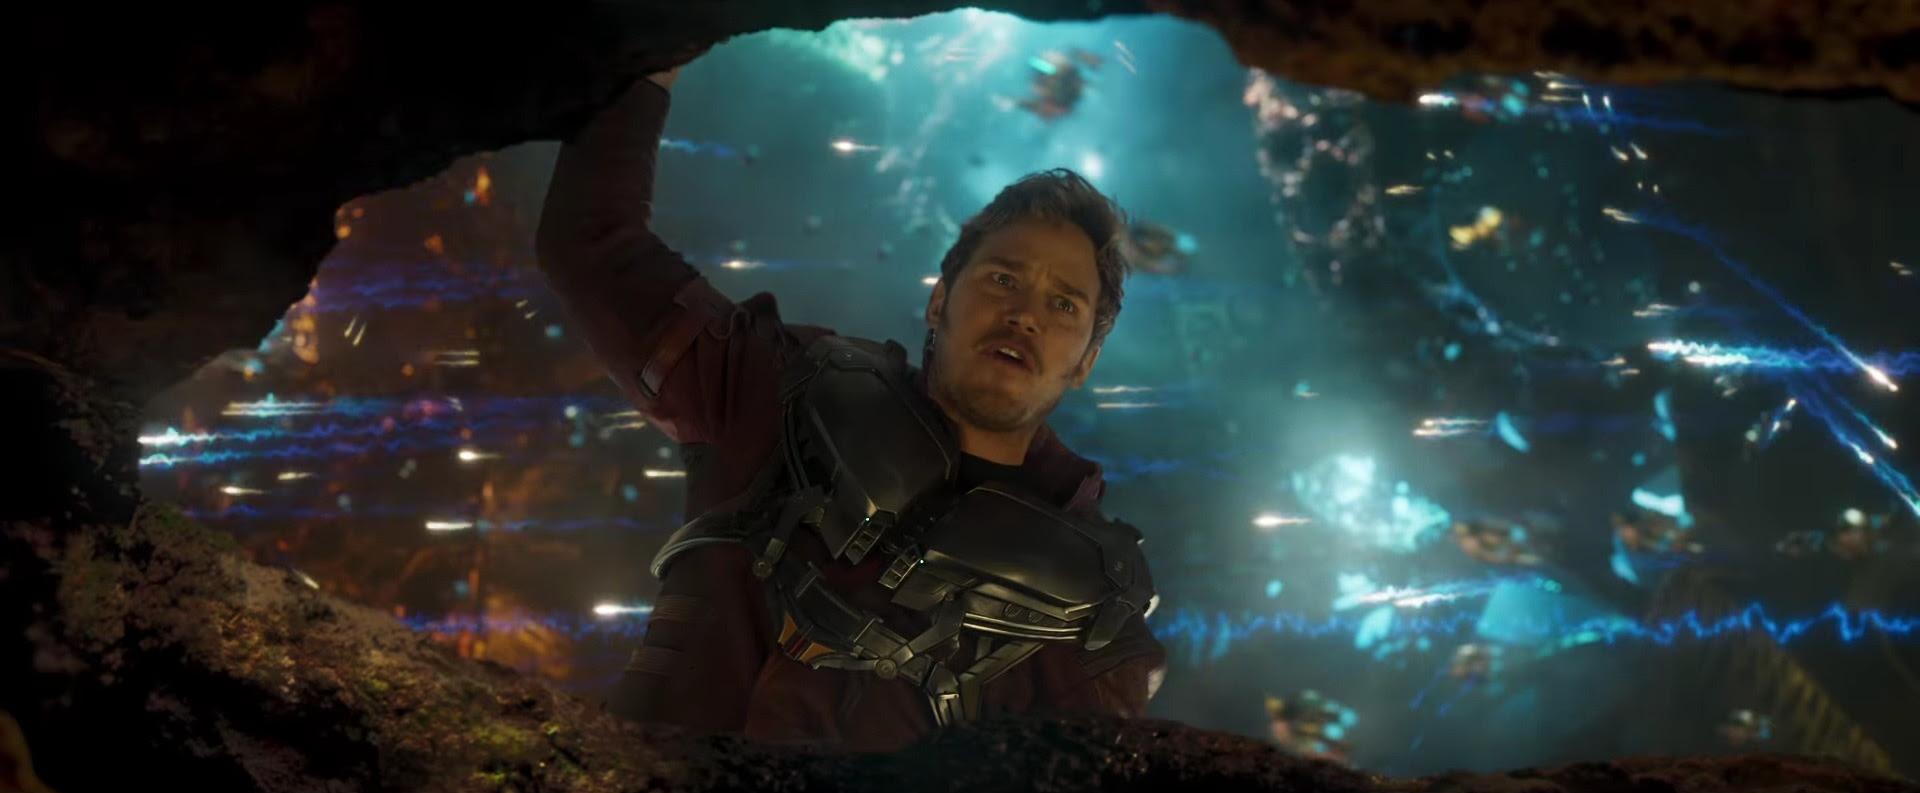 5 Most Memorable Guardians of the Galaxy Vol. 2 Movie